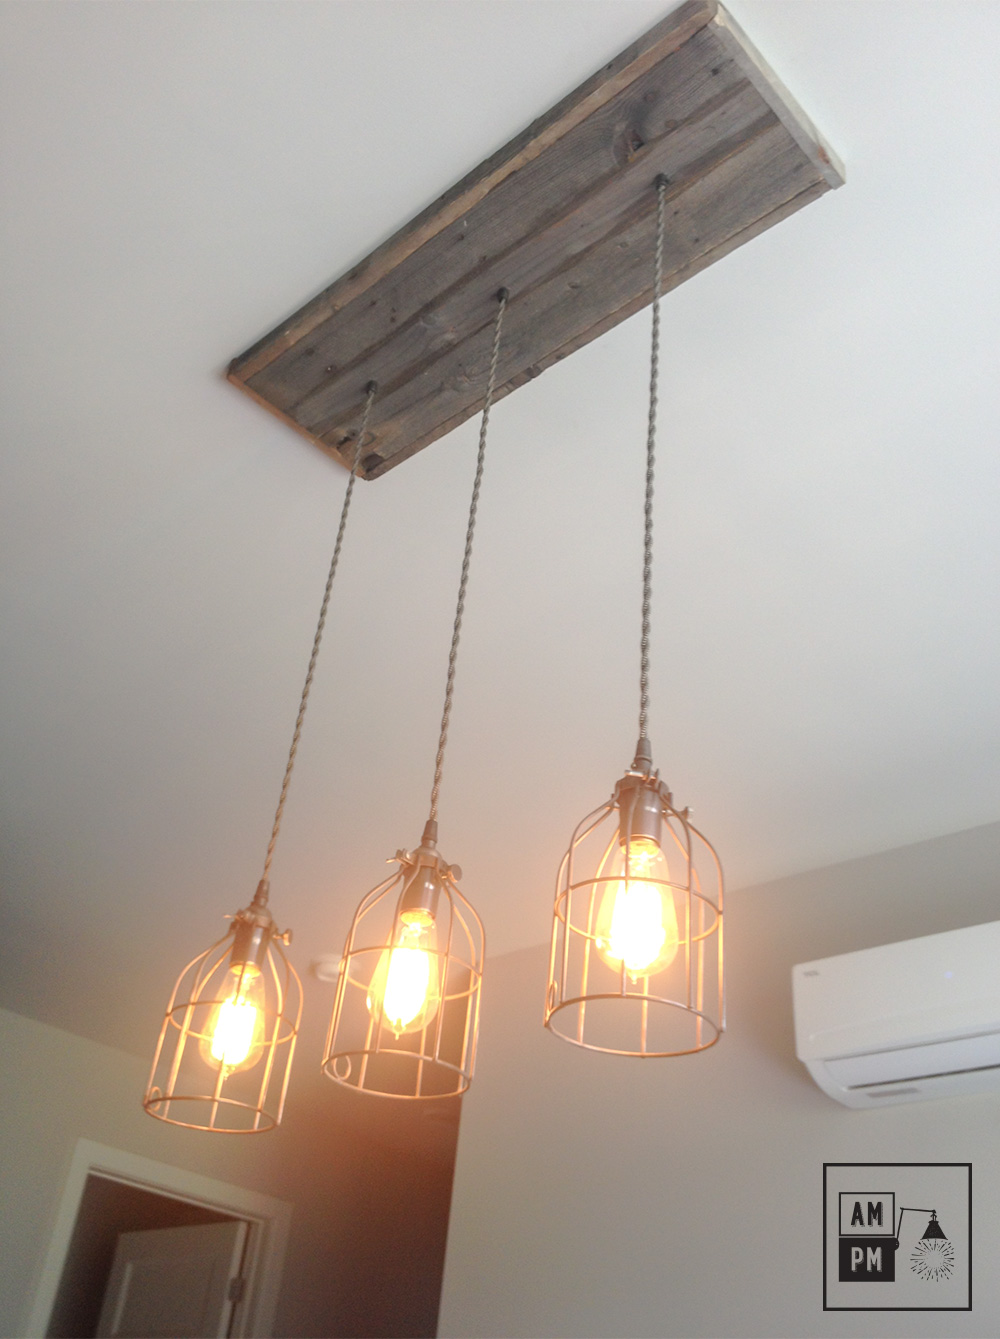 30 superbe luminaire suspendu industriel jdt4 luminaire salon. Black Bedroom Furniture Sets. Home Design Ideas